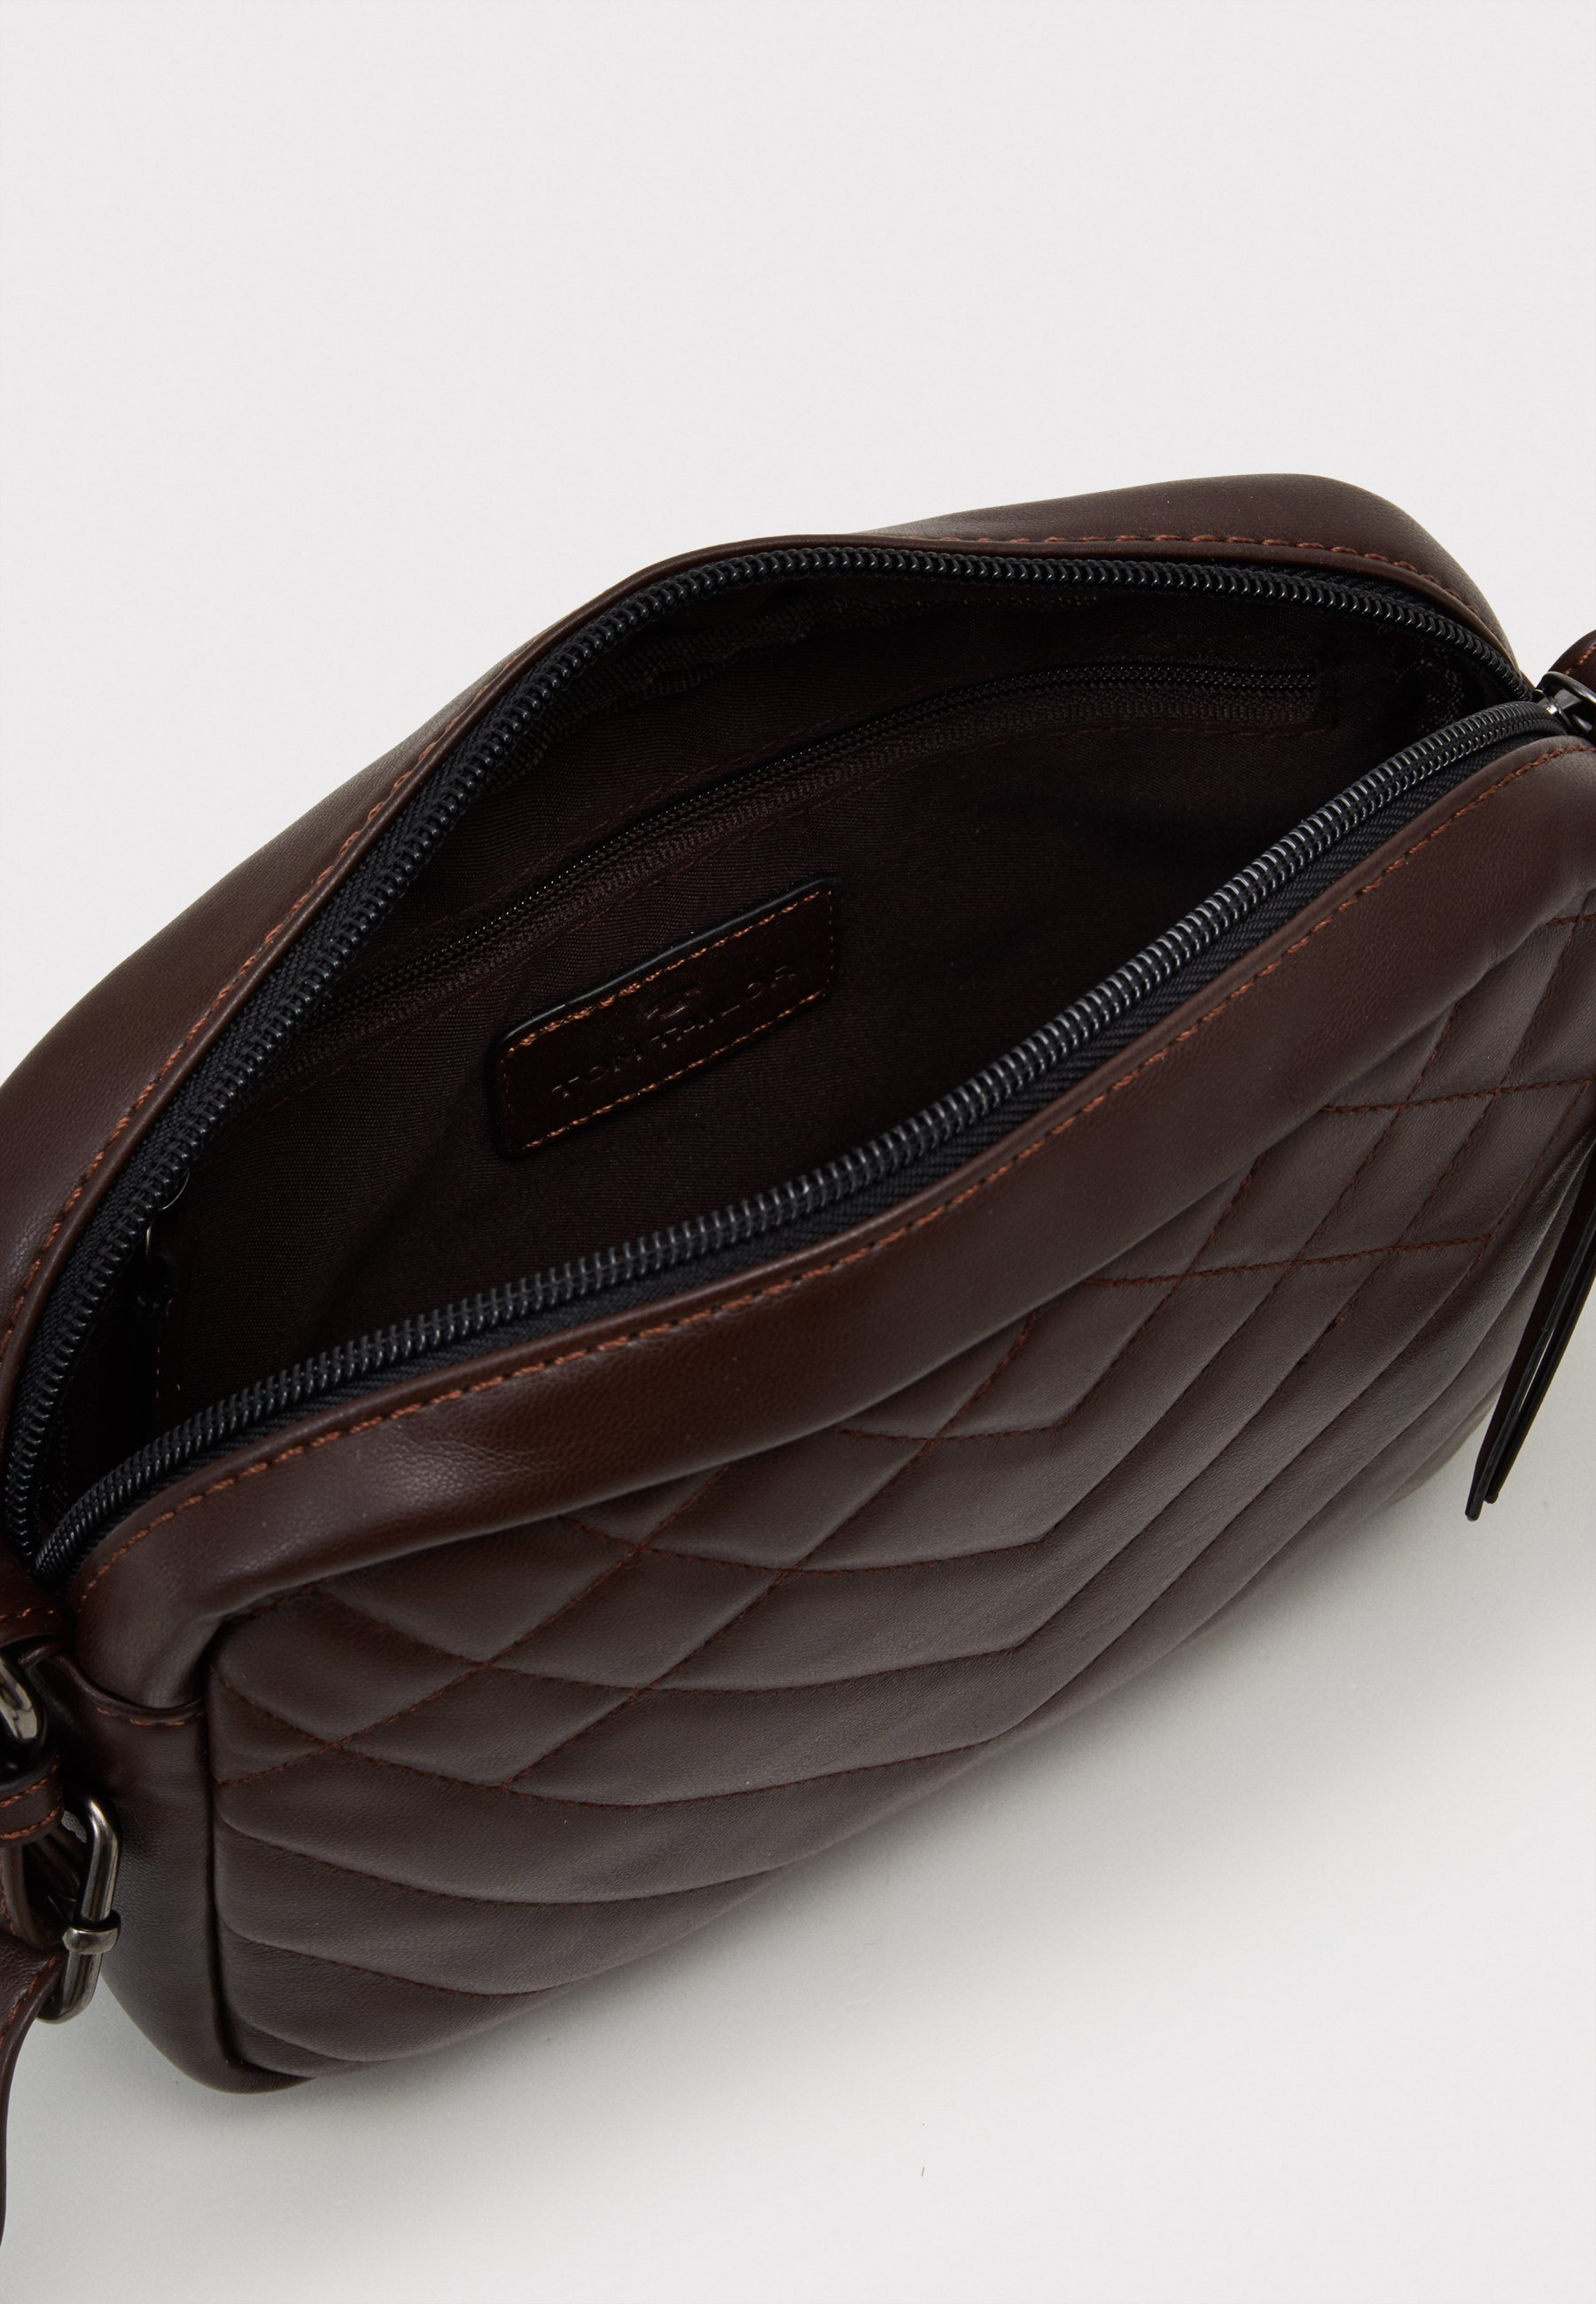 TOM TAILOR JARA - Skulderveske - dark brown/mørkebrun v6nL0mMlAQXIiNT